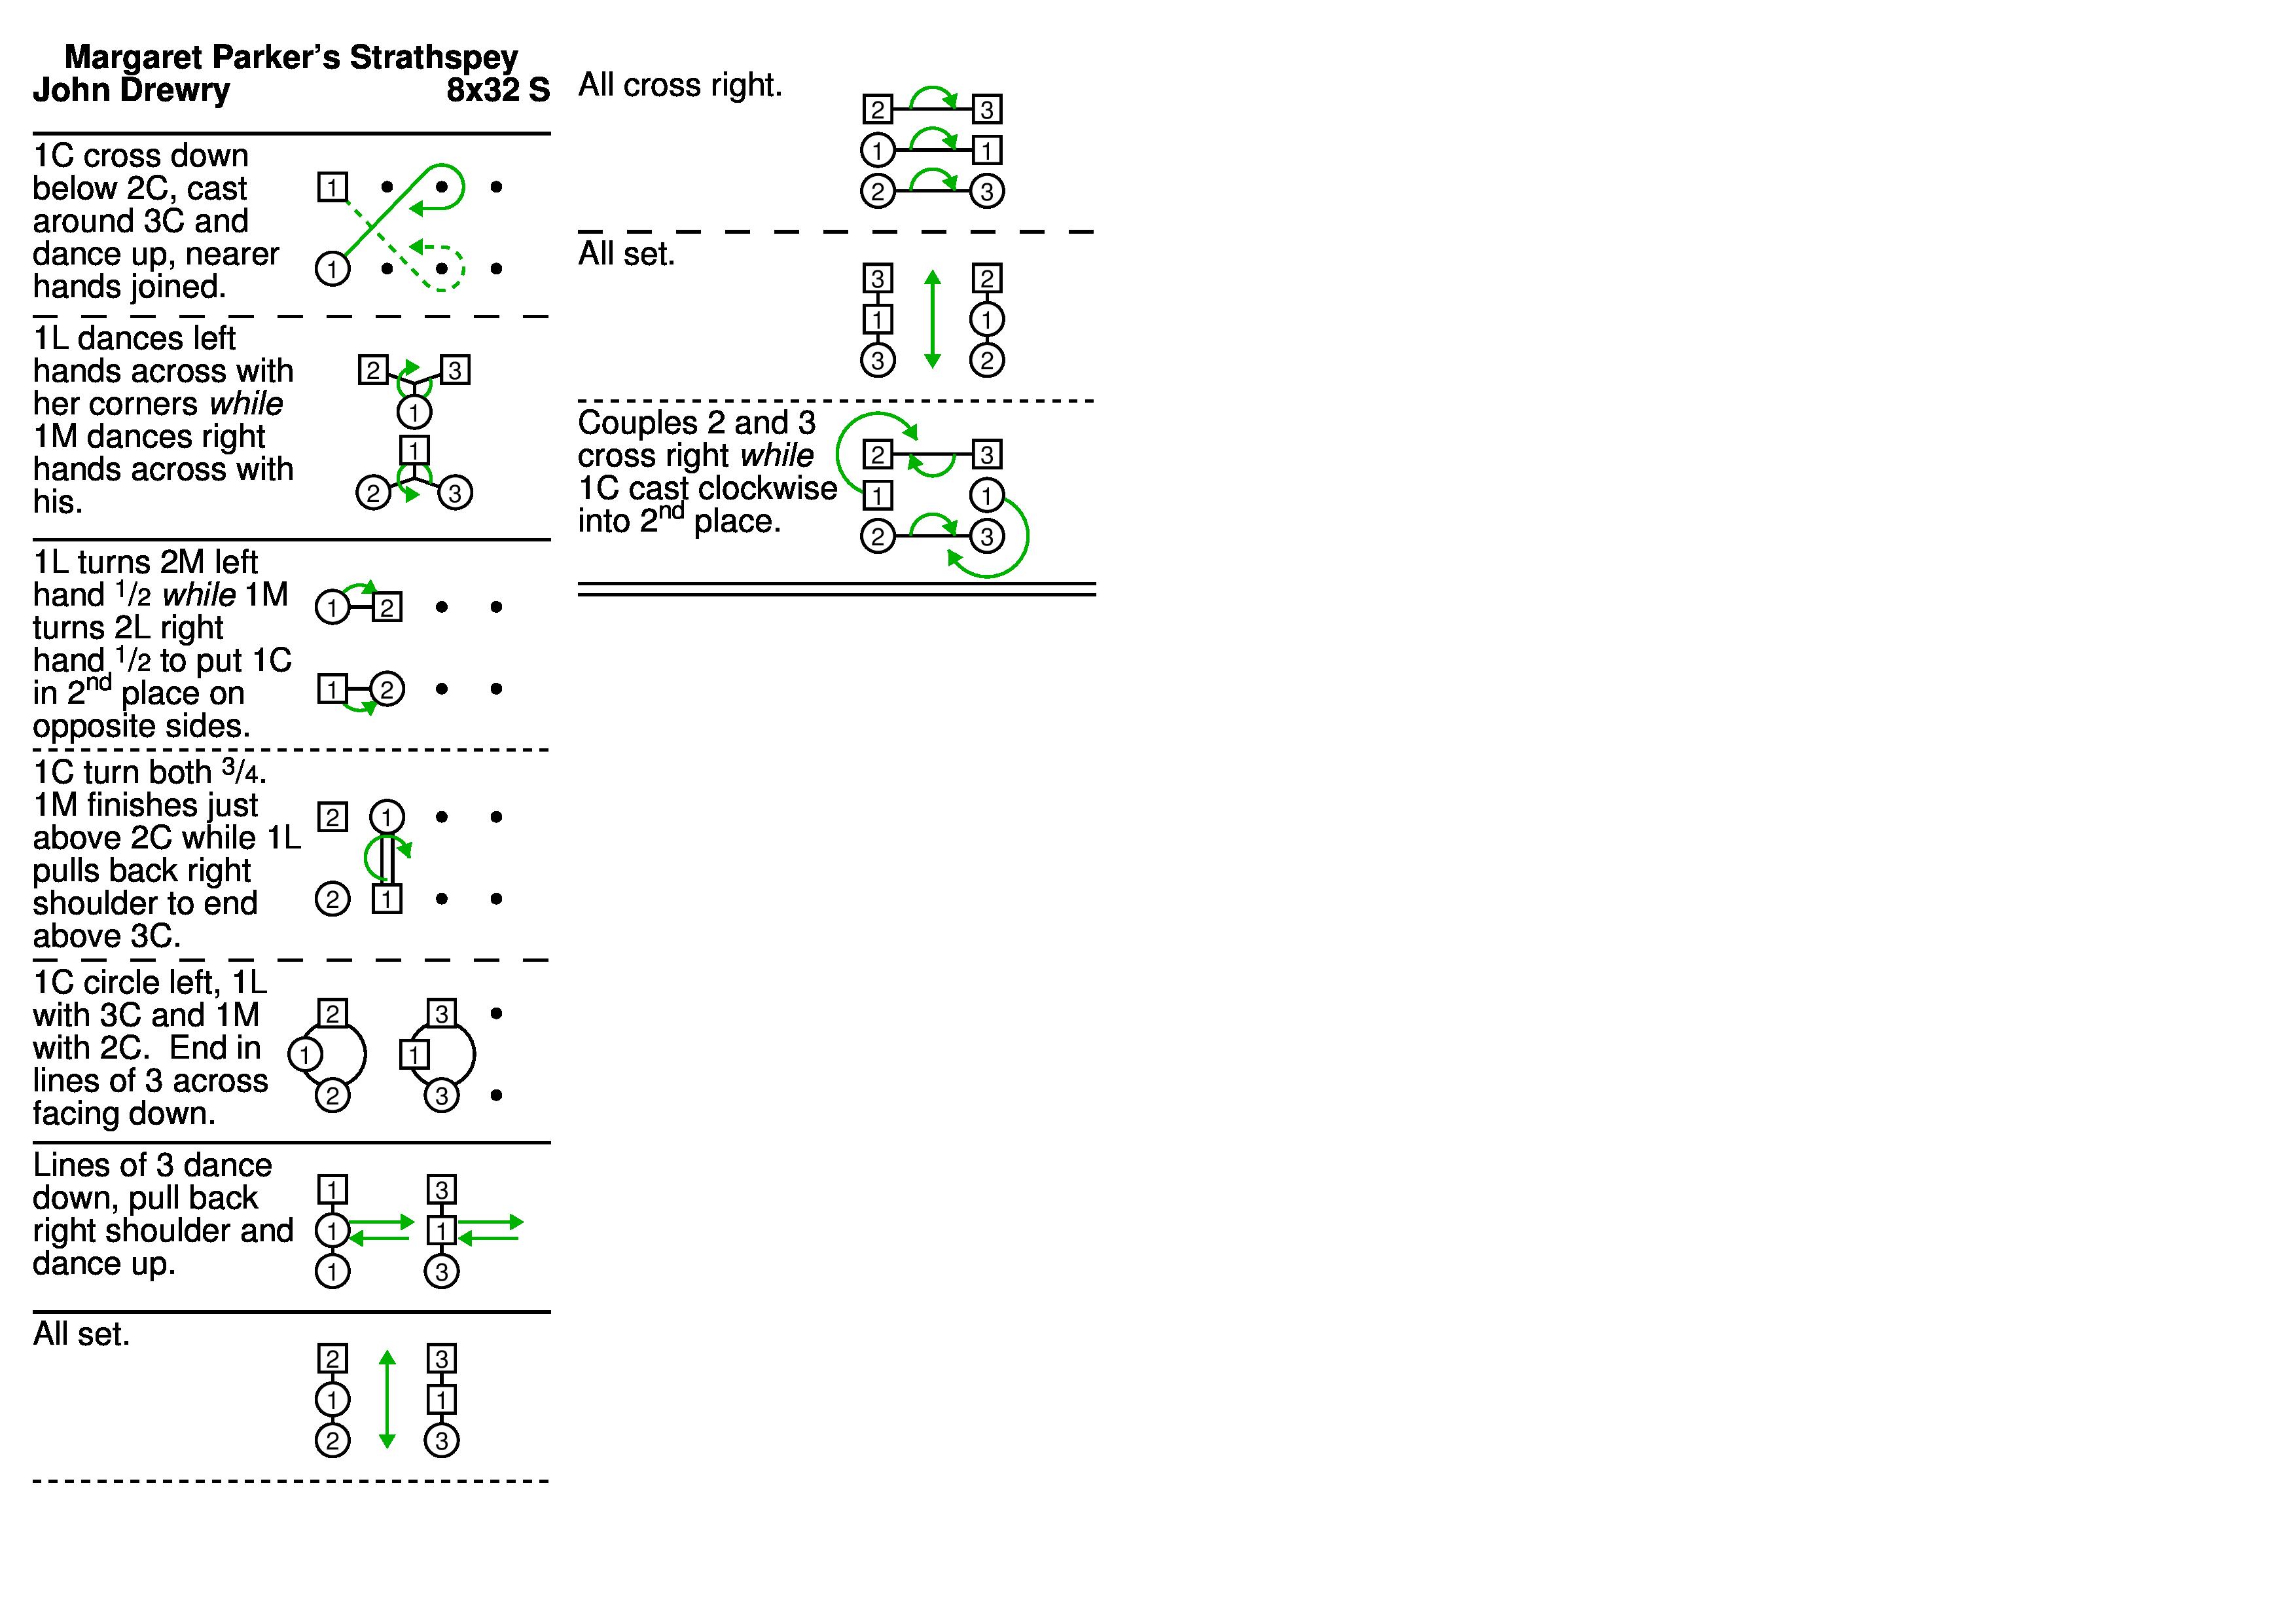 medium resolution of margaret parker s strathspey scottish dance diagrams